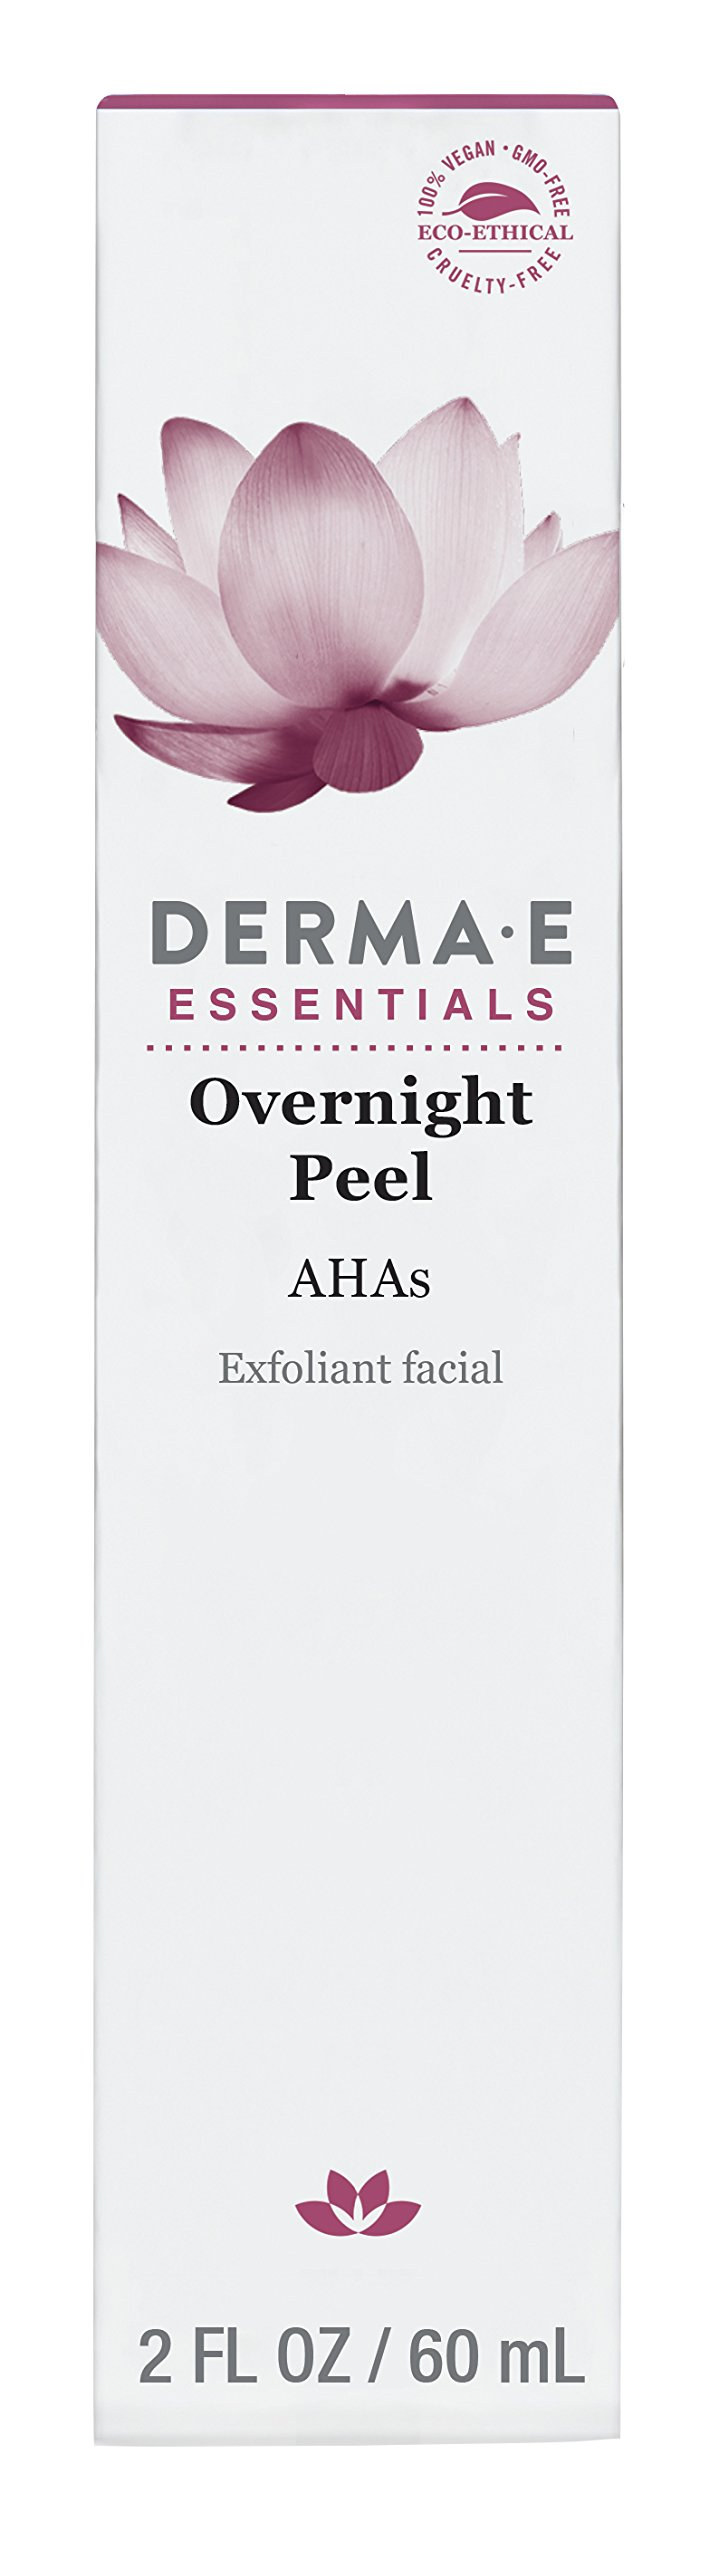 DERMA E Overnight Peel with Alpha Hydroxy Acids 2oz by DERMA-E (Image #3)